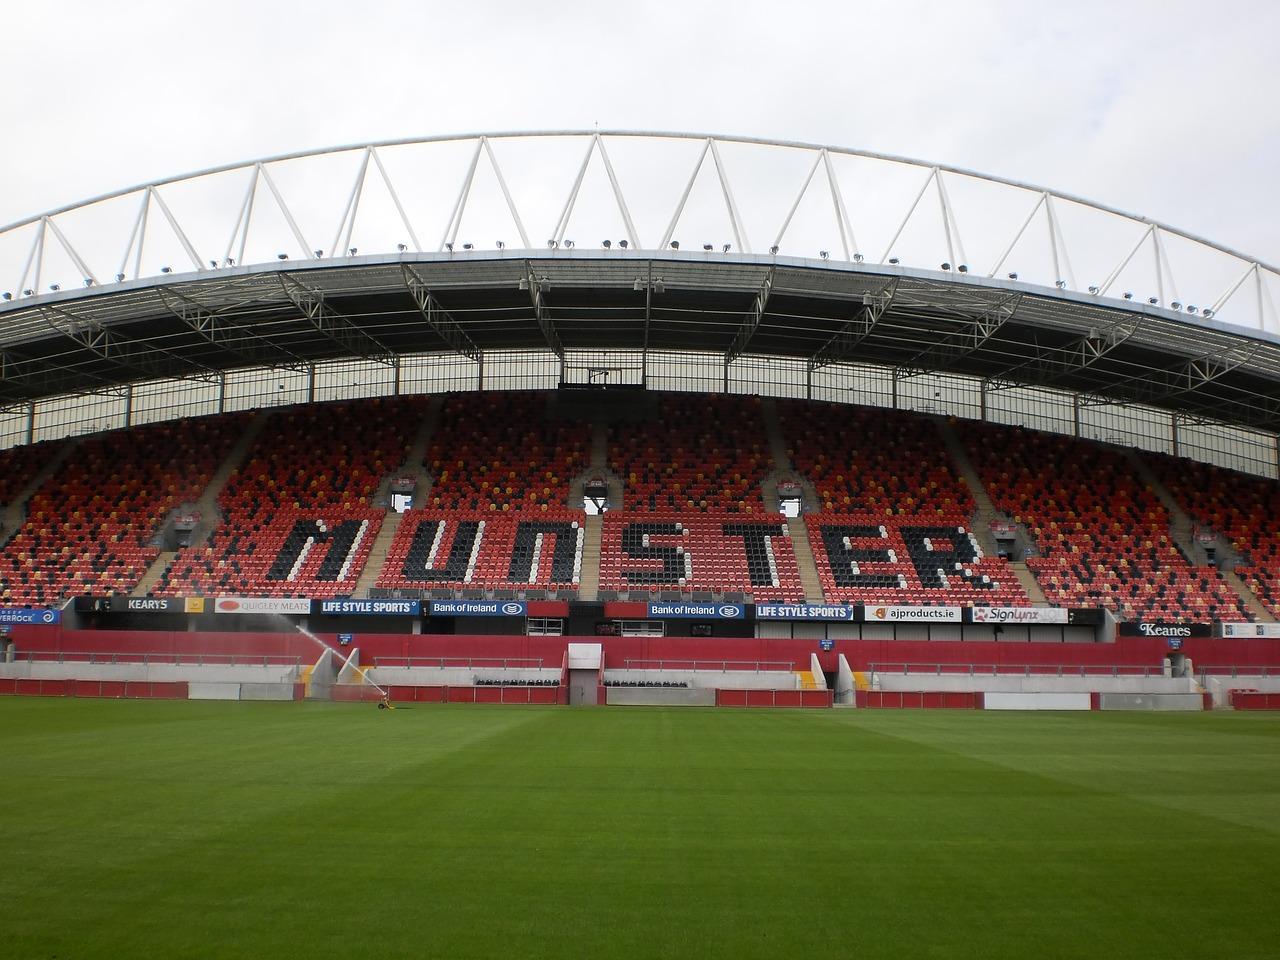 Munter Rugby Stadium Limerick | Private Tours Ireland